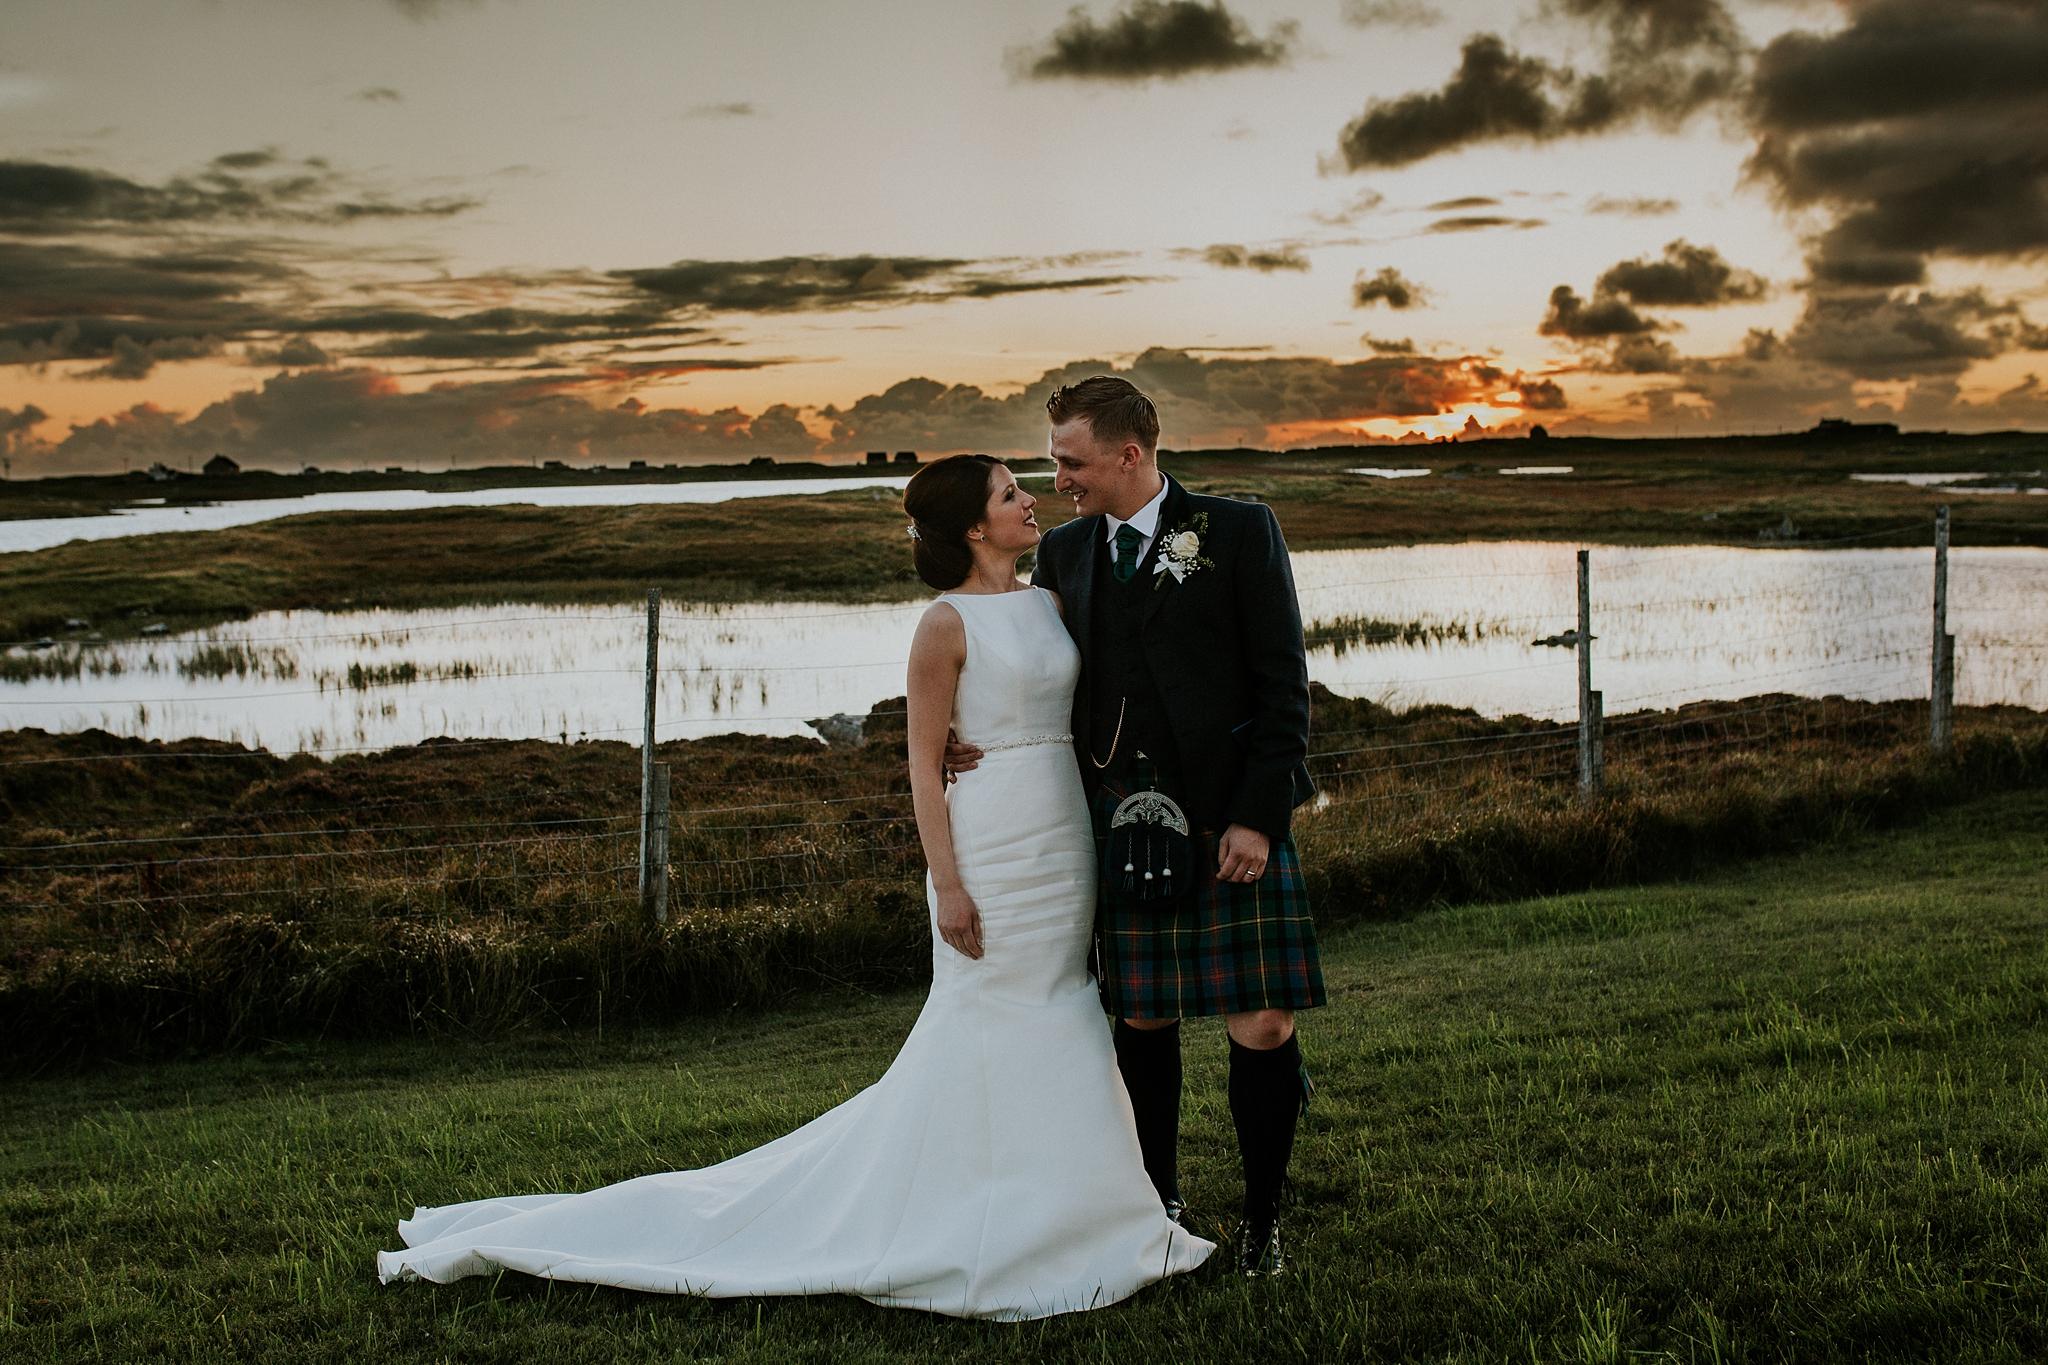 Linda&Shockie_northuist_wedding_photographer-54.JPG